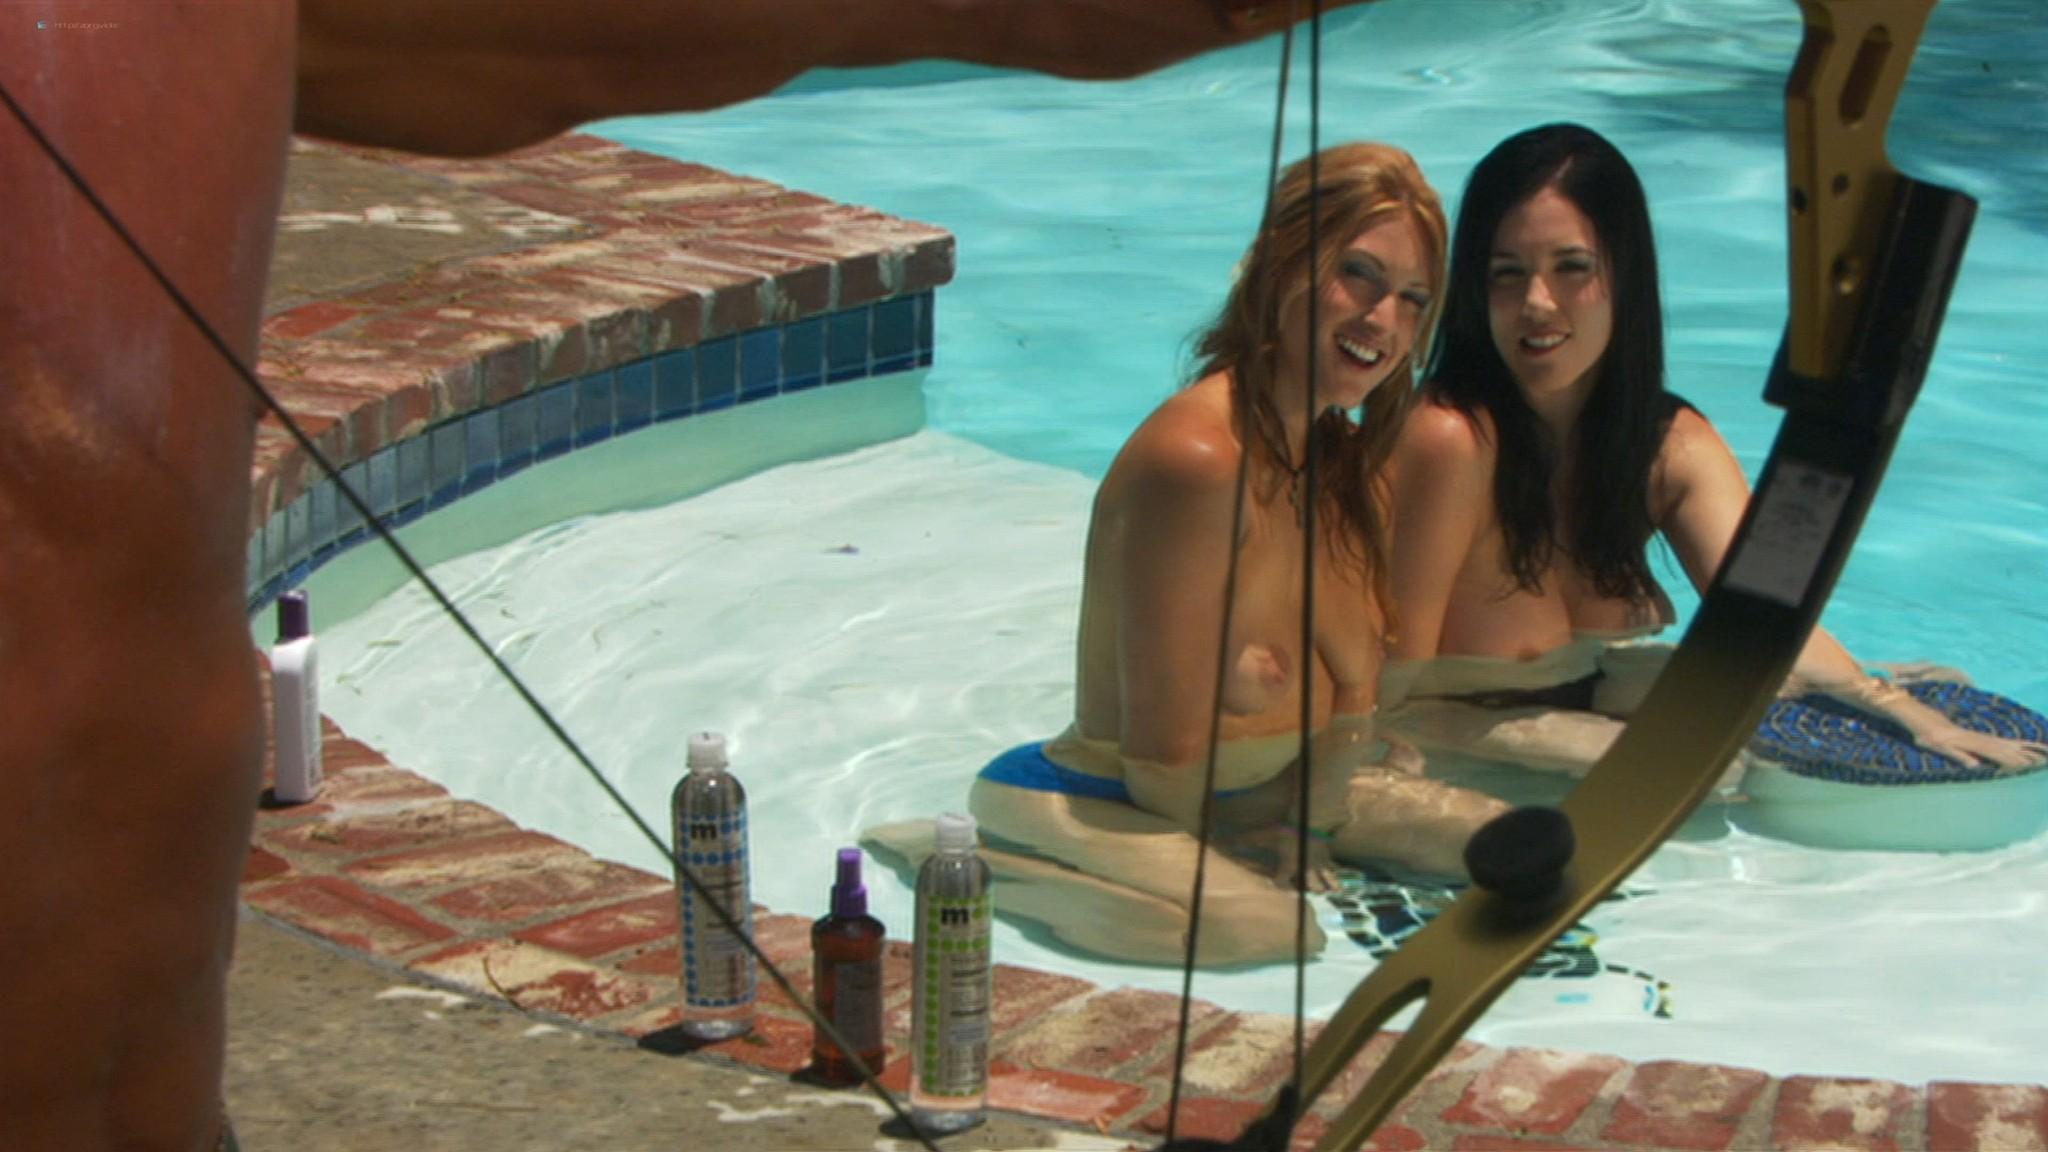 Kaley Cuoco hot Izabella Scorupco sexy others nude - Cougar Club (2007) HD 1080p BluRay (4)